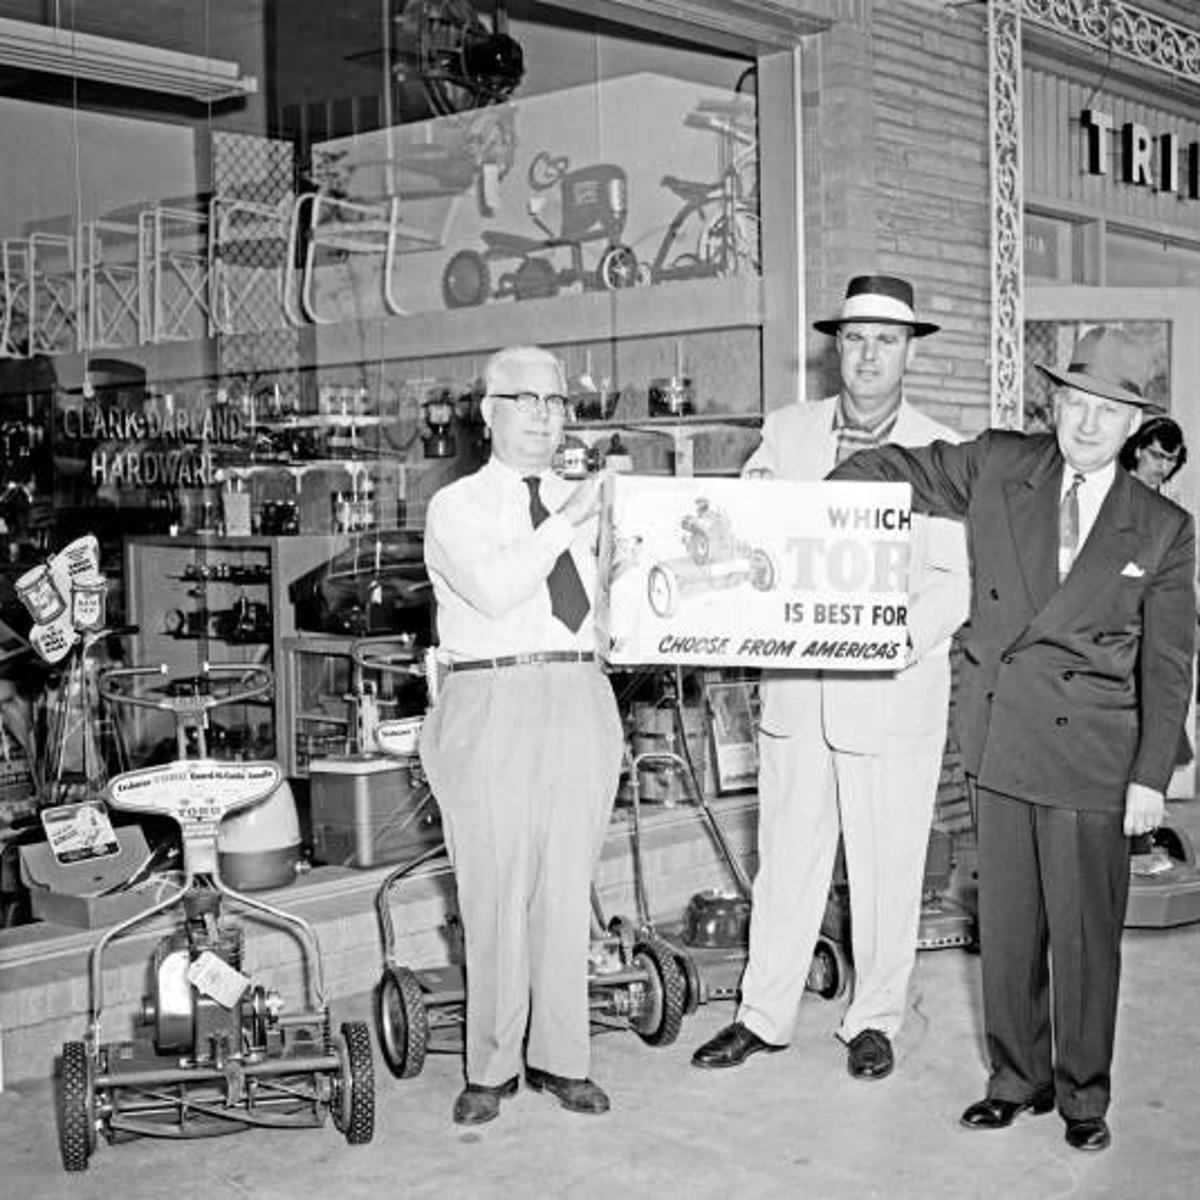 Throwback Tulsa: Utica Square wasn't always so fashionable